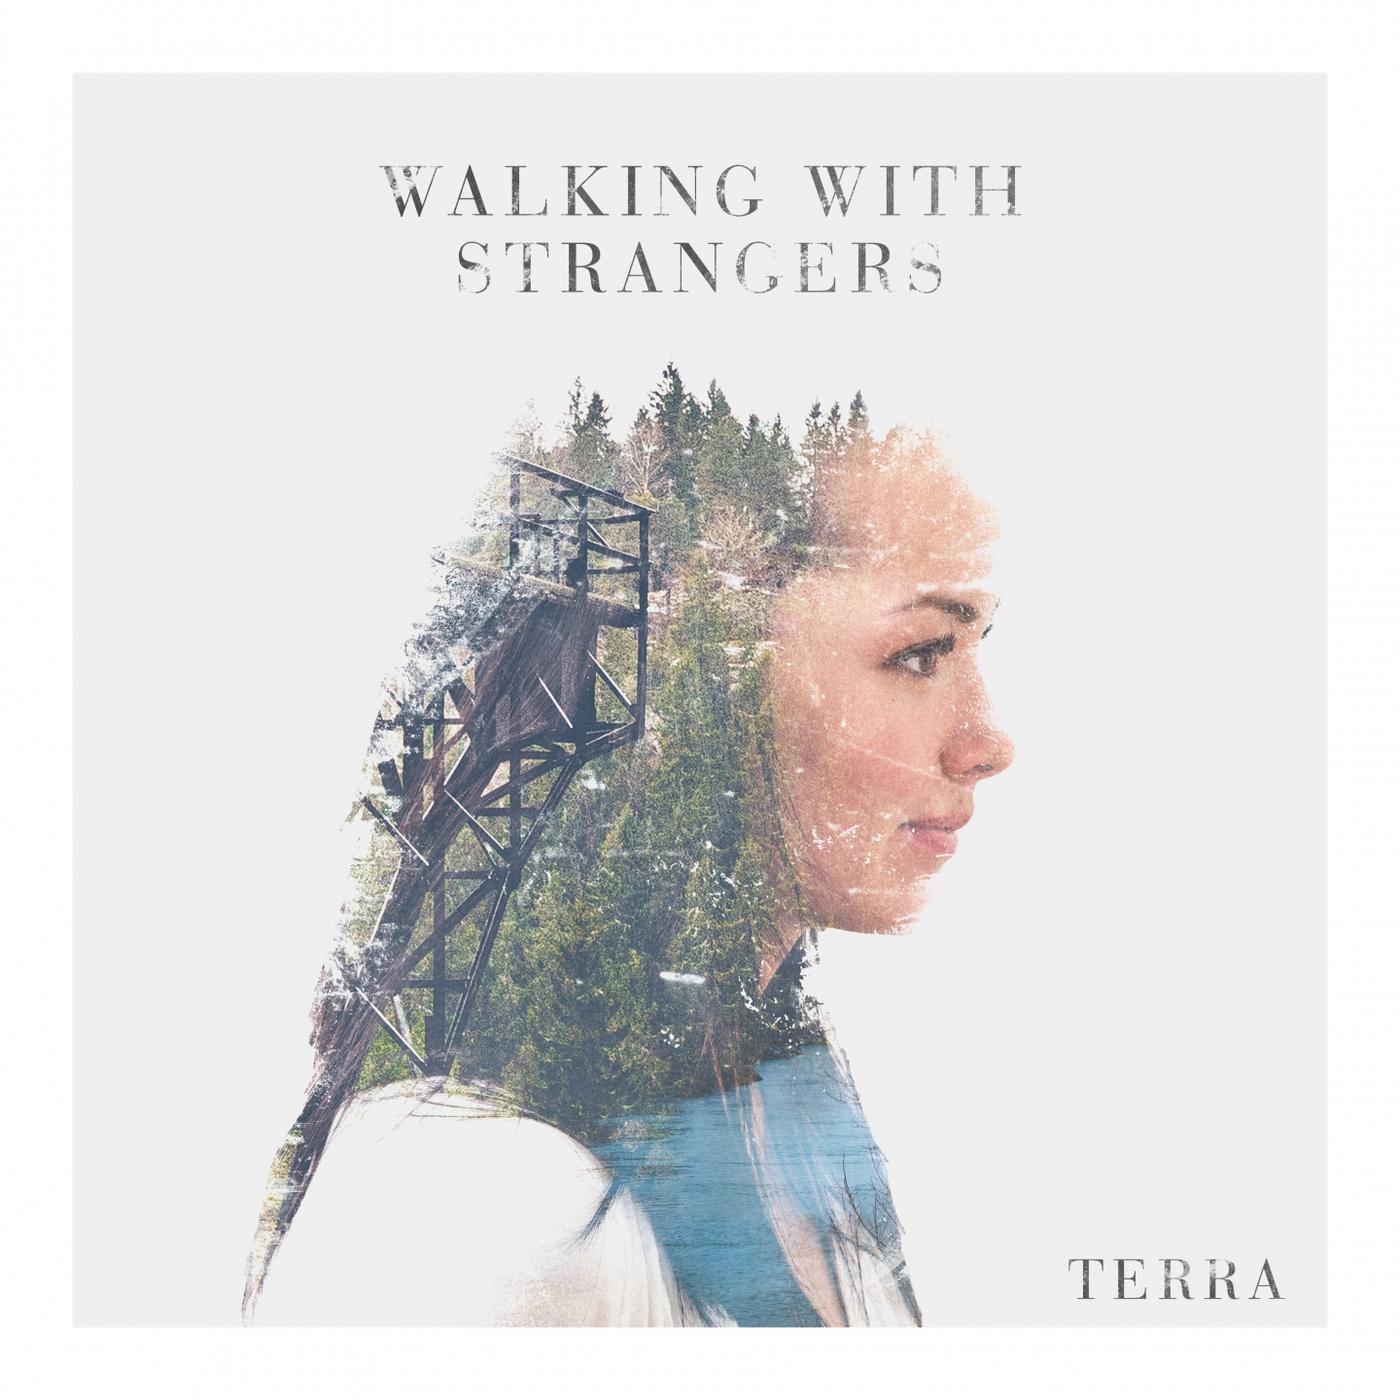 Walking With Strangers - Terra (2015)